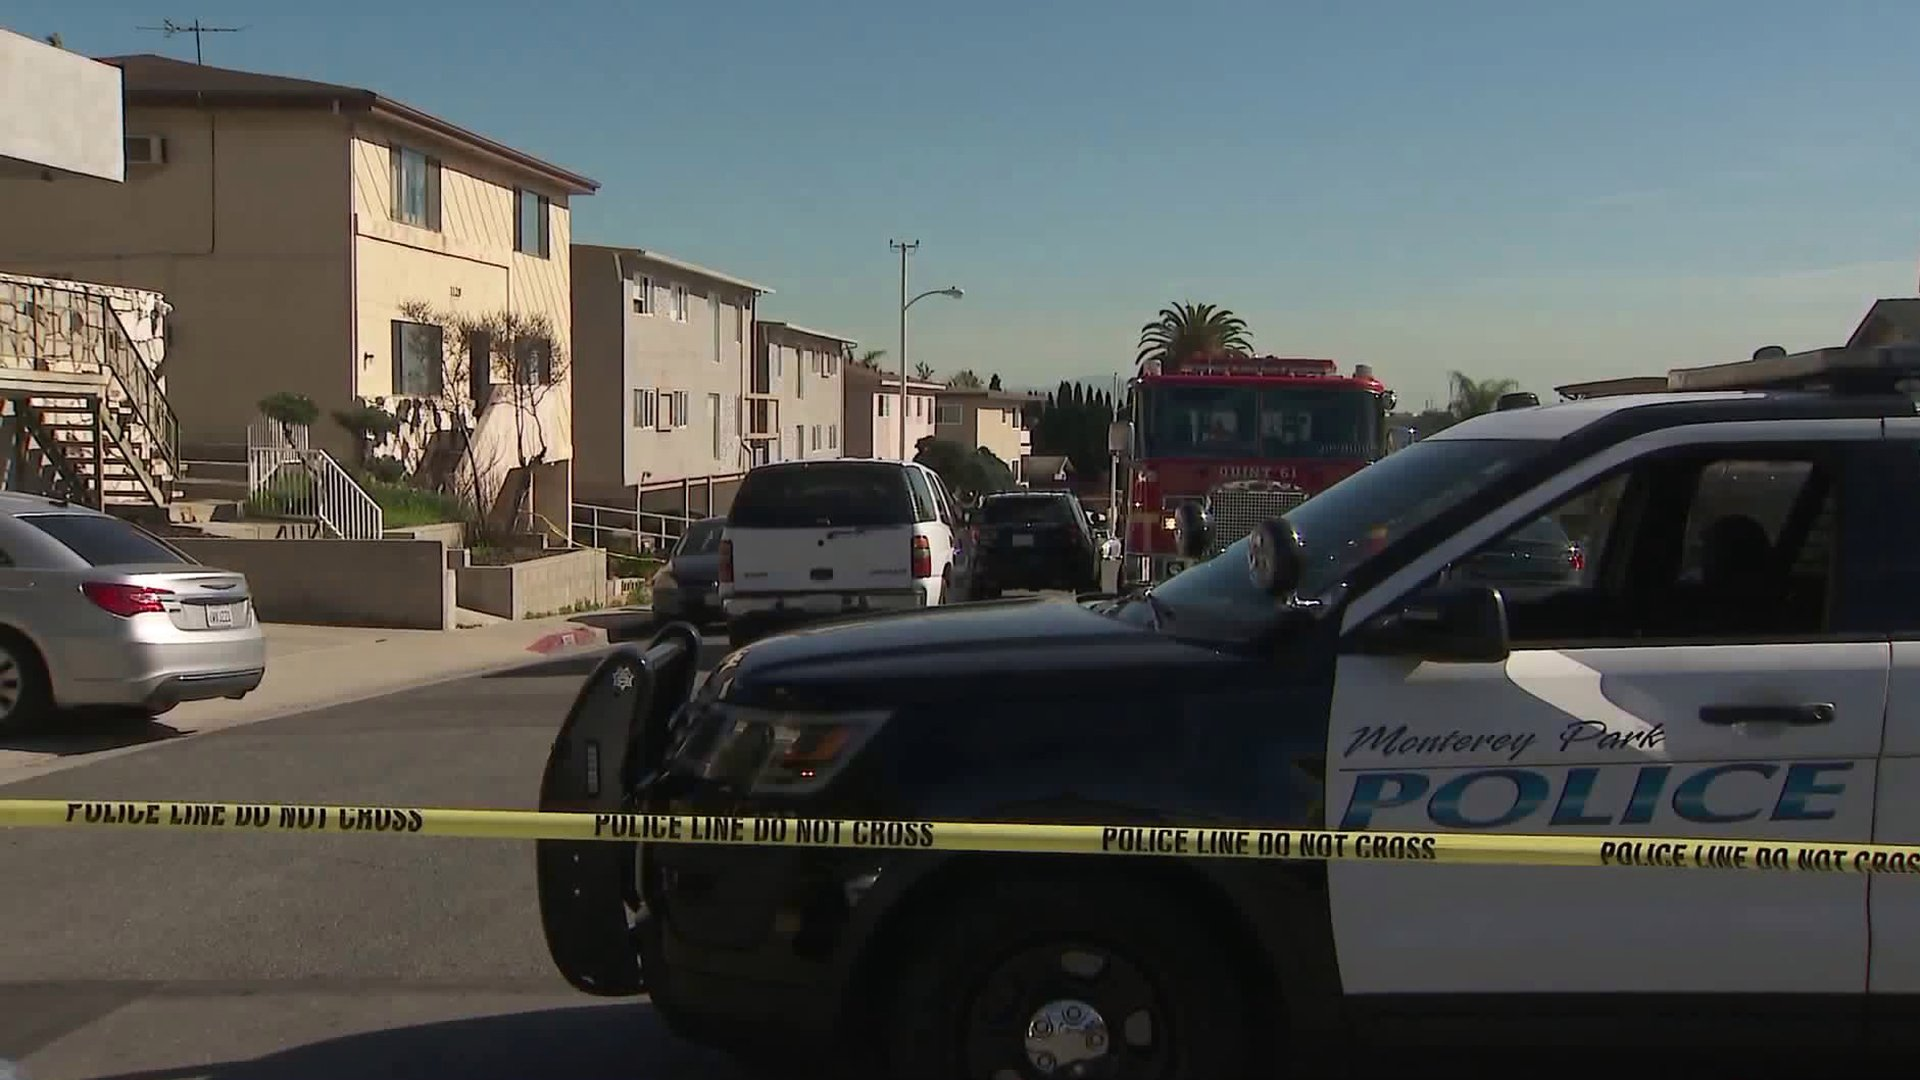 Police respond to a death investigation in Monterey Park on Jan. 31, 2020. (Credit: KTLA)